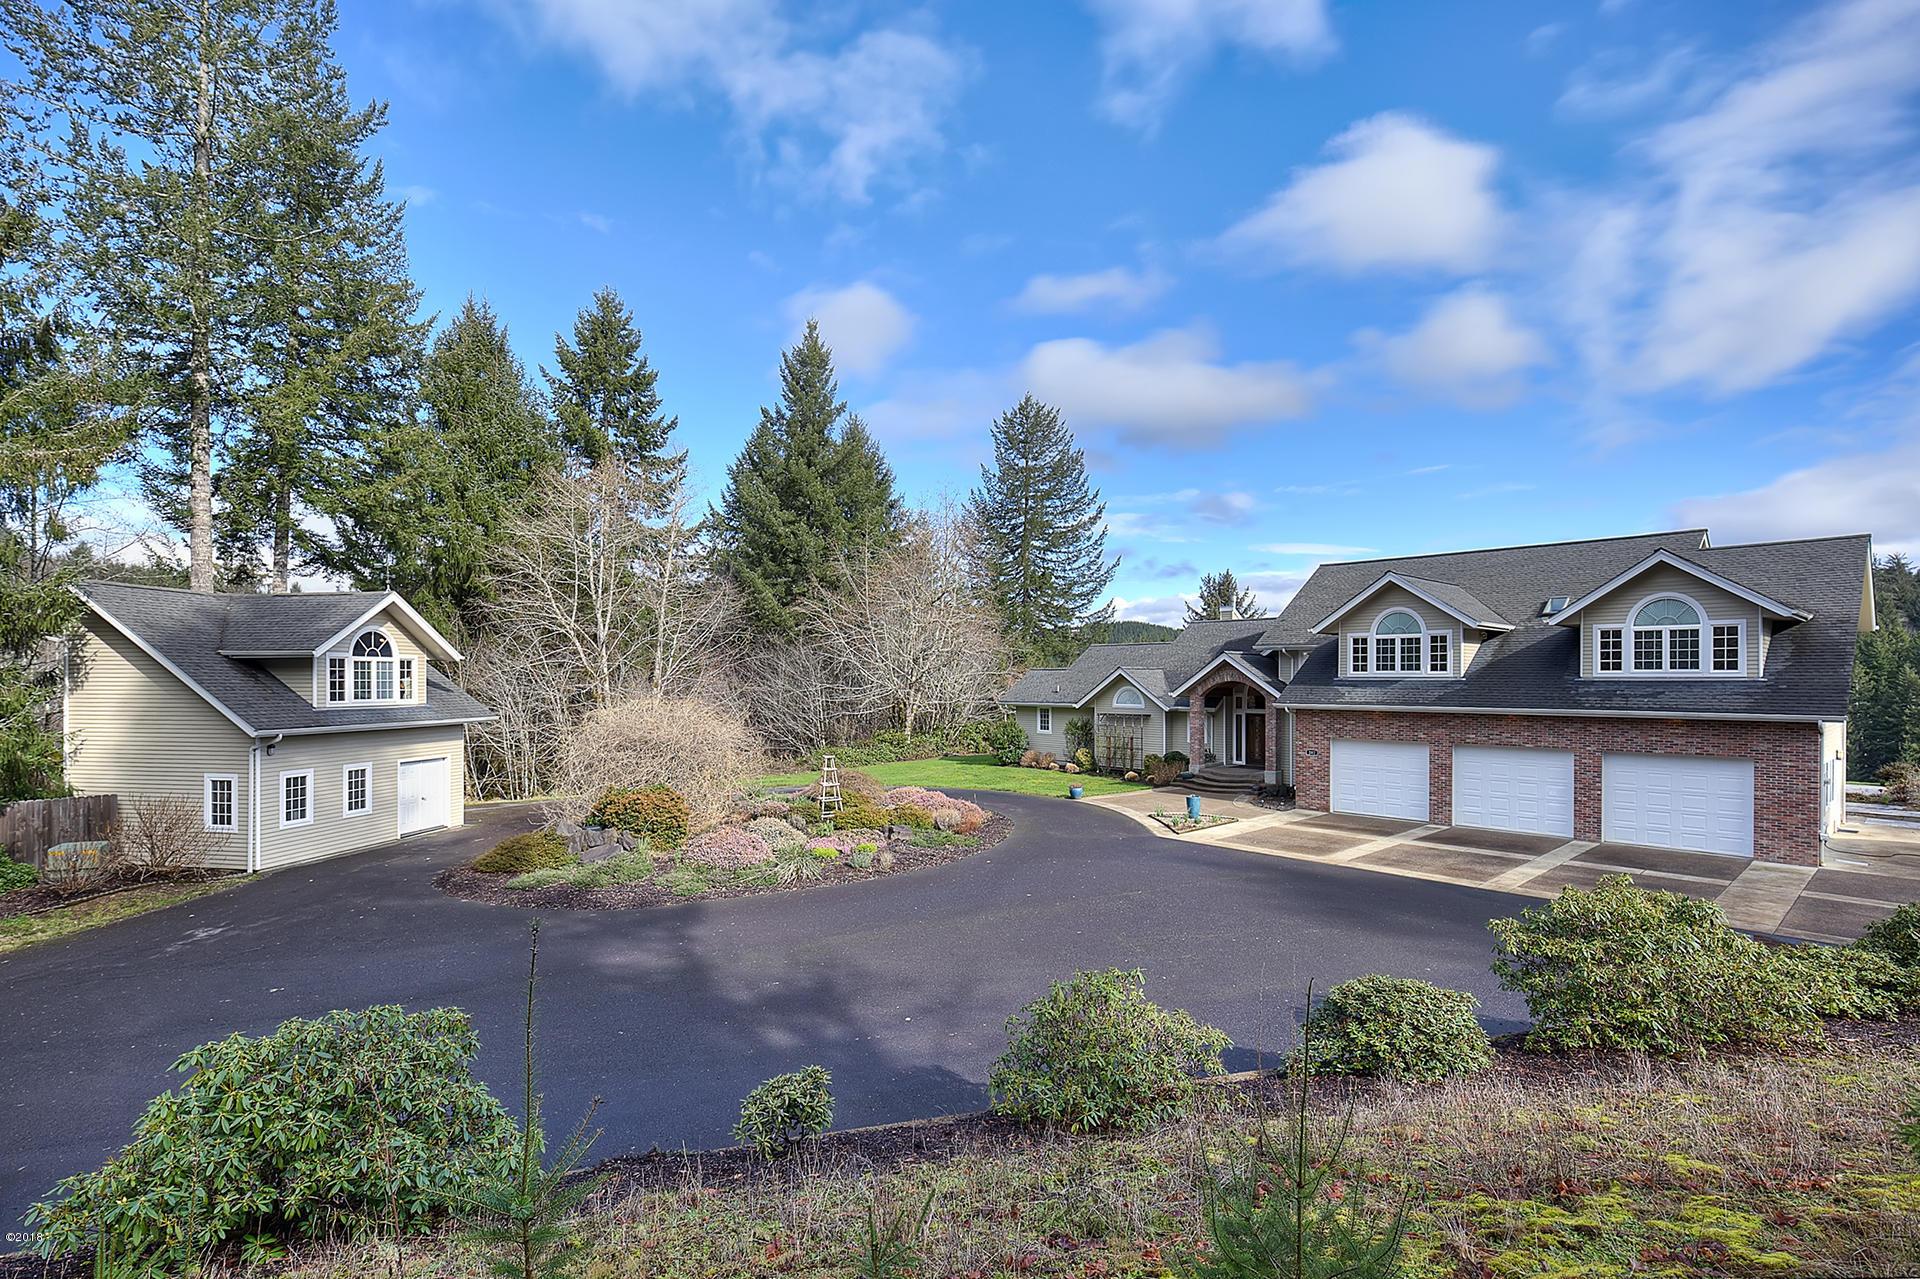 202 Olalla View Drive, Toledo, OR 97391 - Fabulous Home w/circular driveway